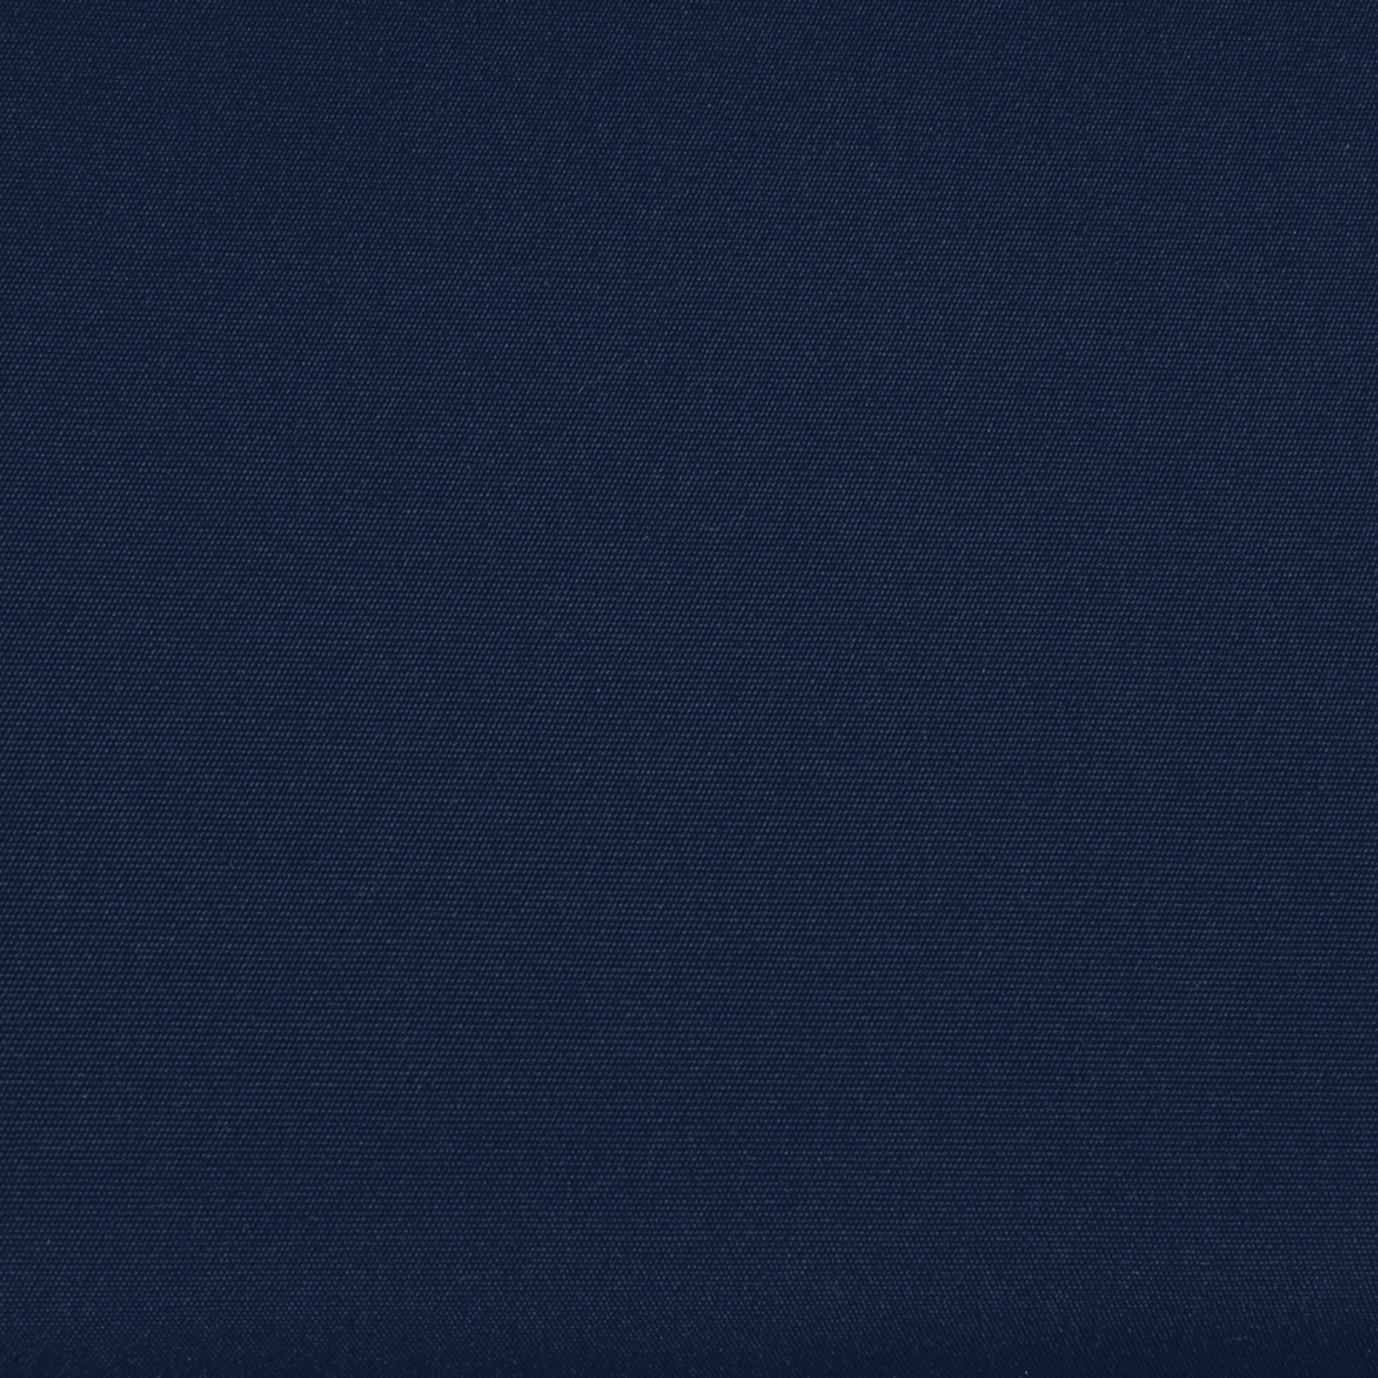 Milo™ Gray Ottomans - Navy Blue